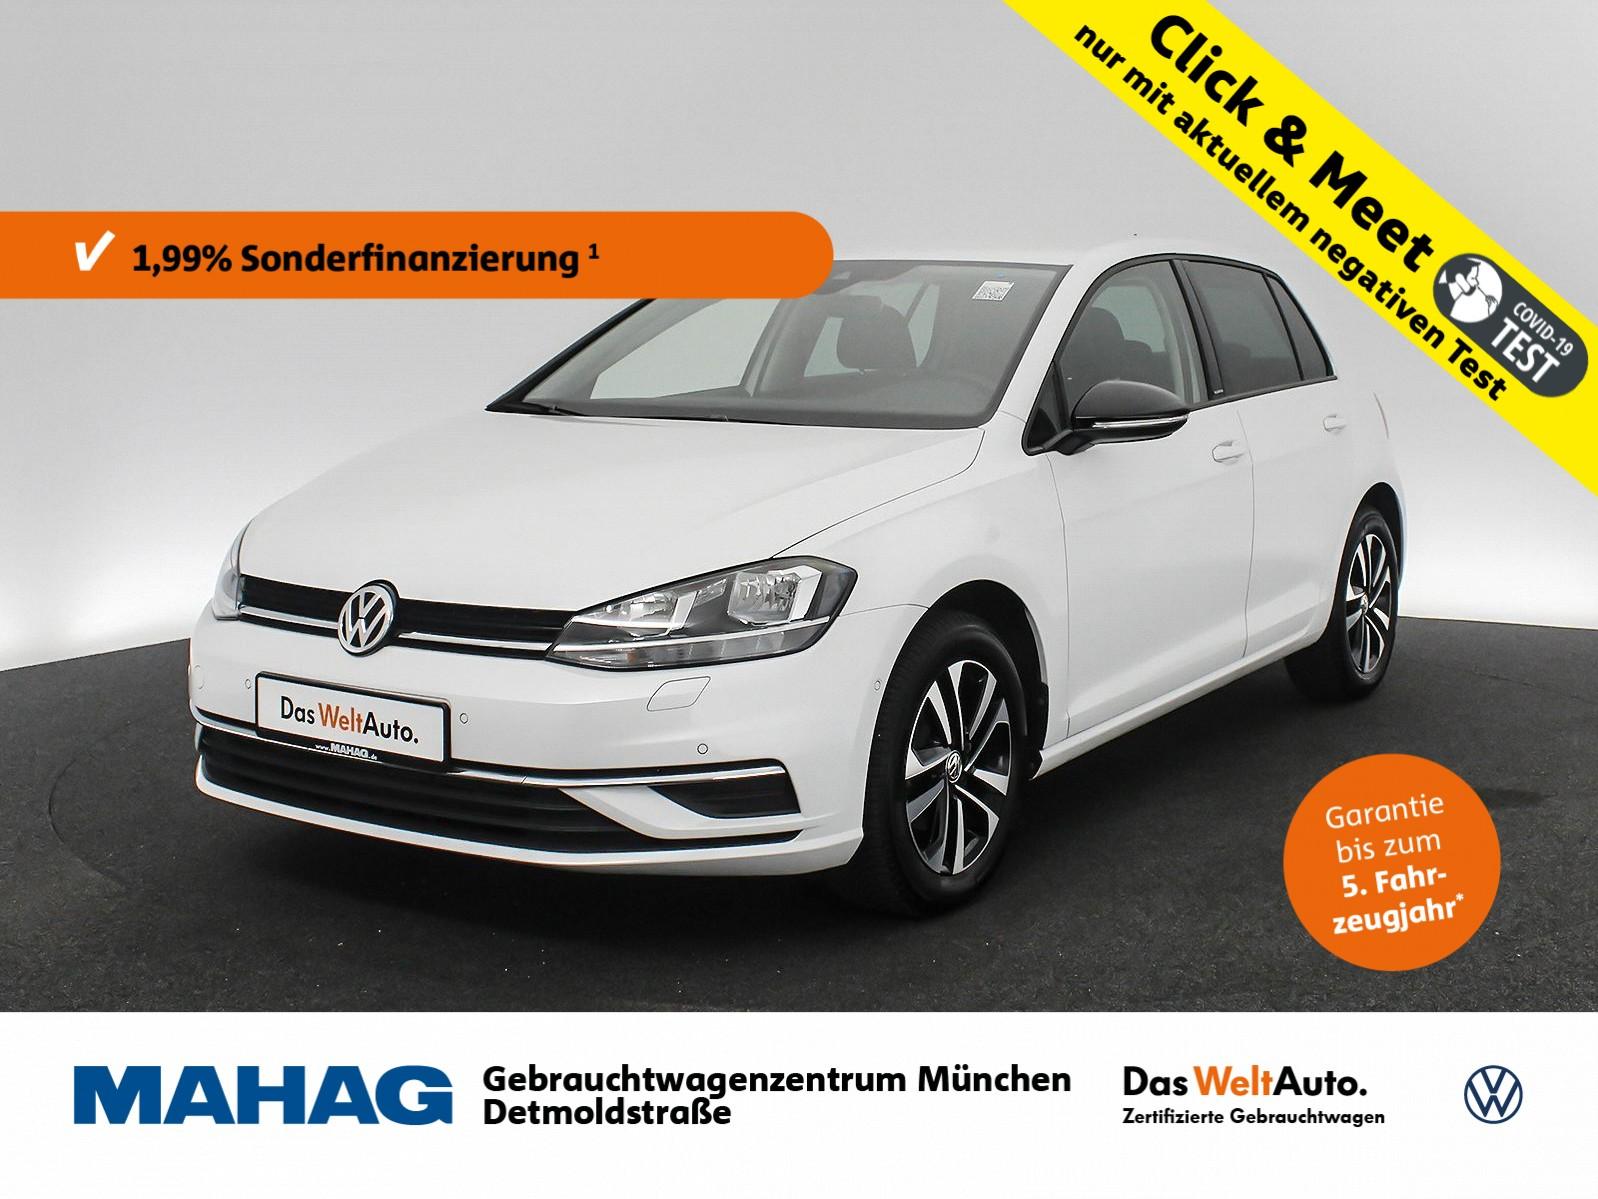 Volkswagen Golf VII 1.0 TSI IQ.DRIVE Navi ParkLenkAssist Bluetooth LightAssist 16Zoll 6-Gang, Jahr 2019, Benzin